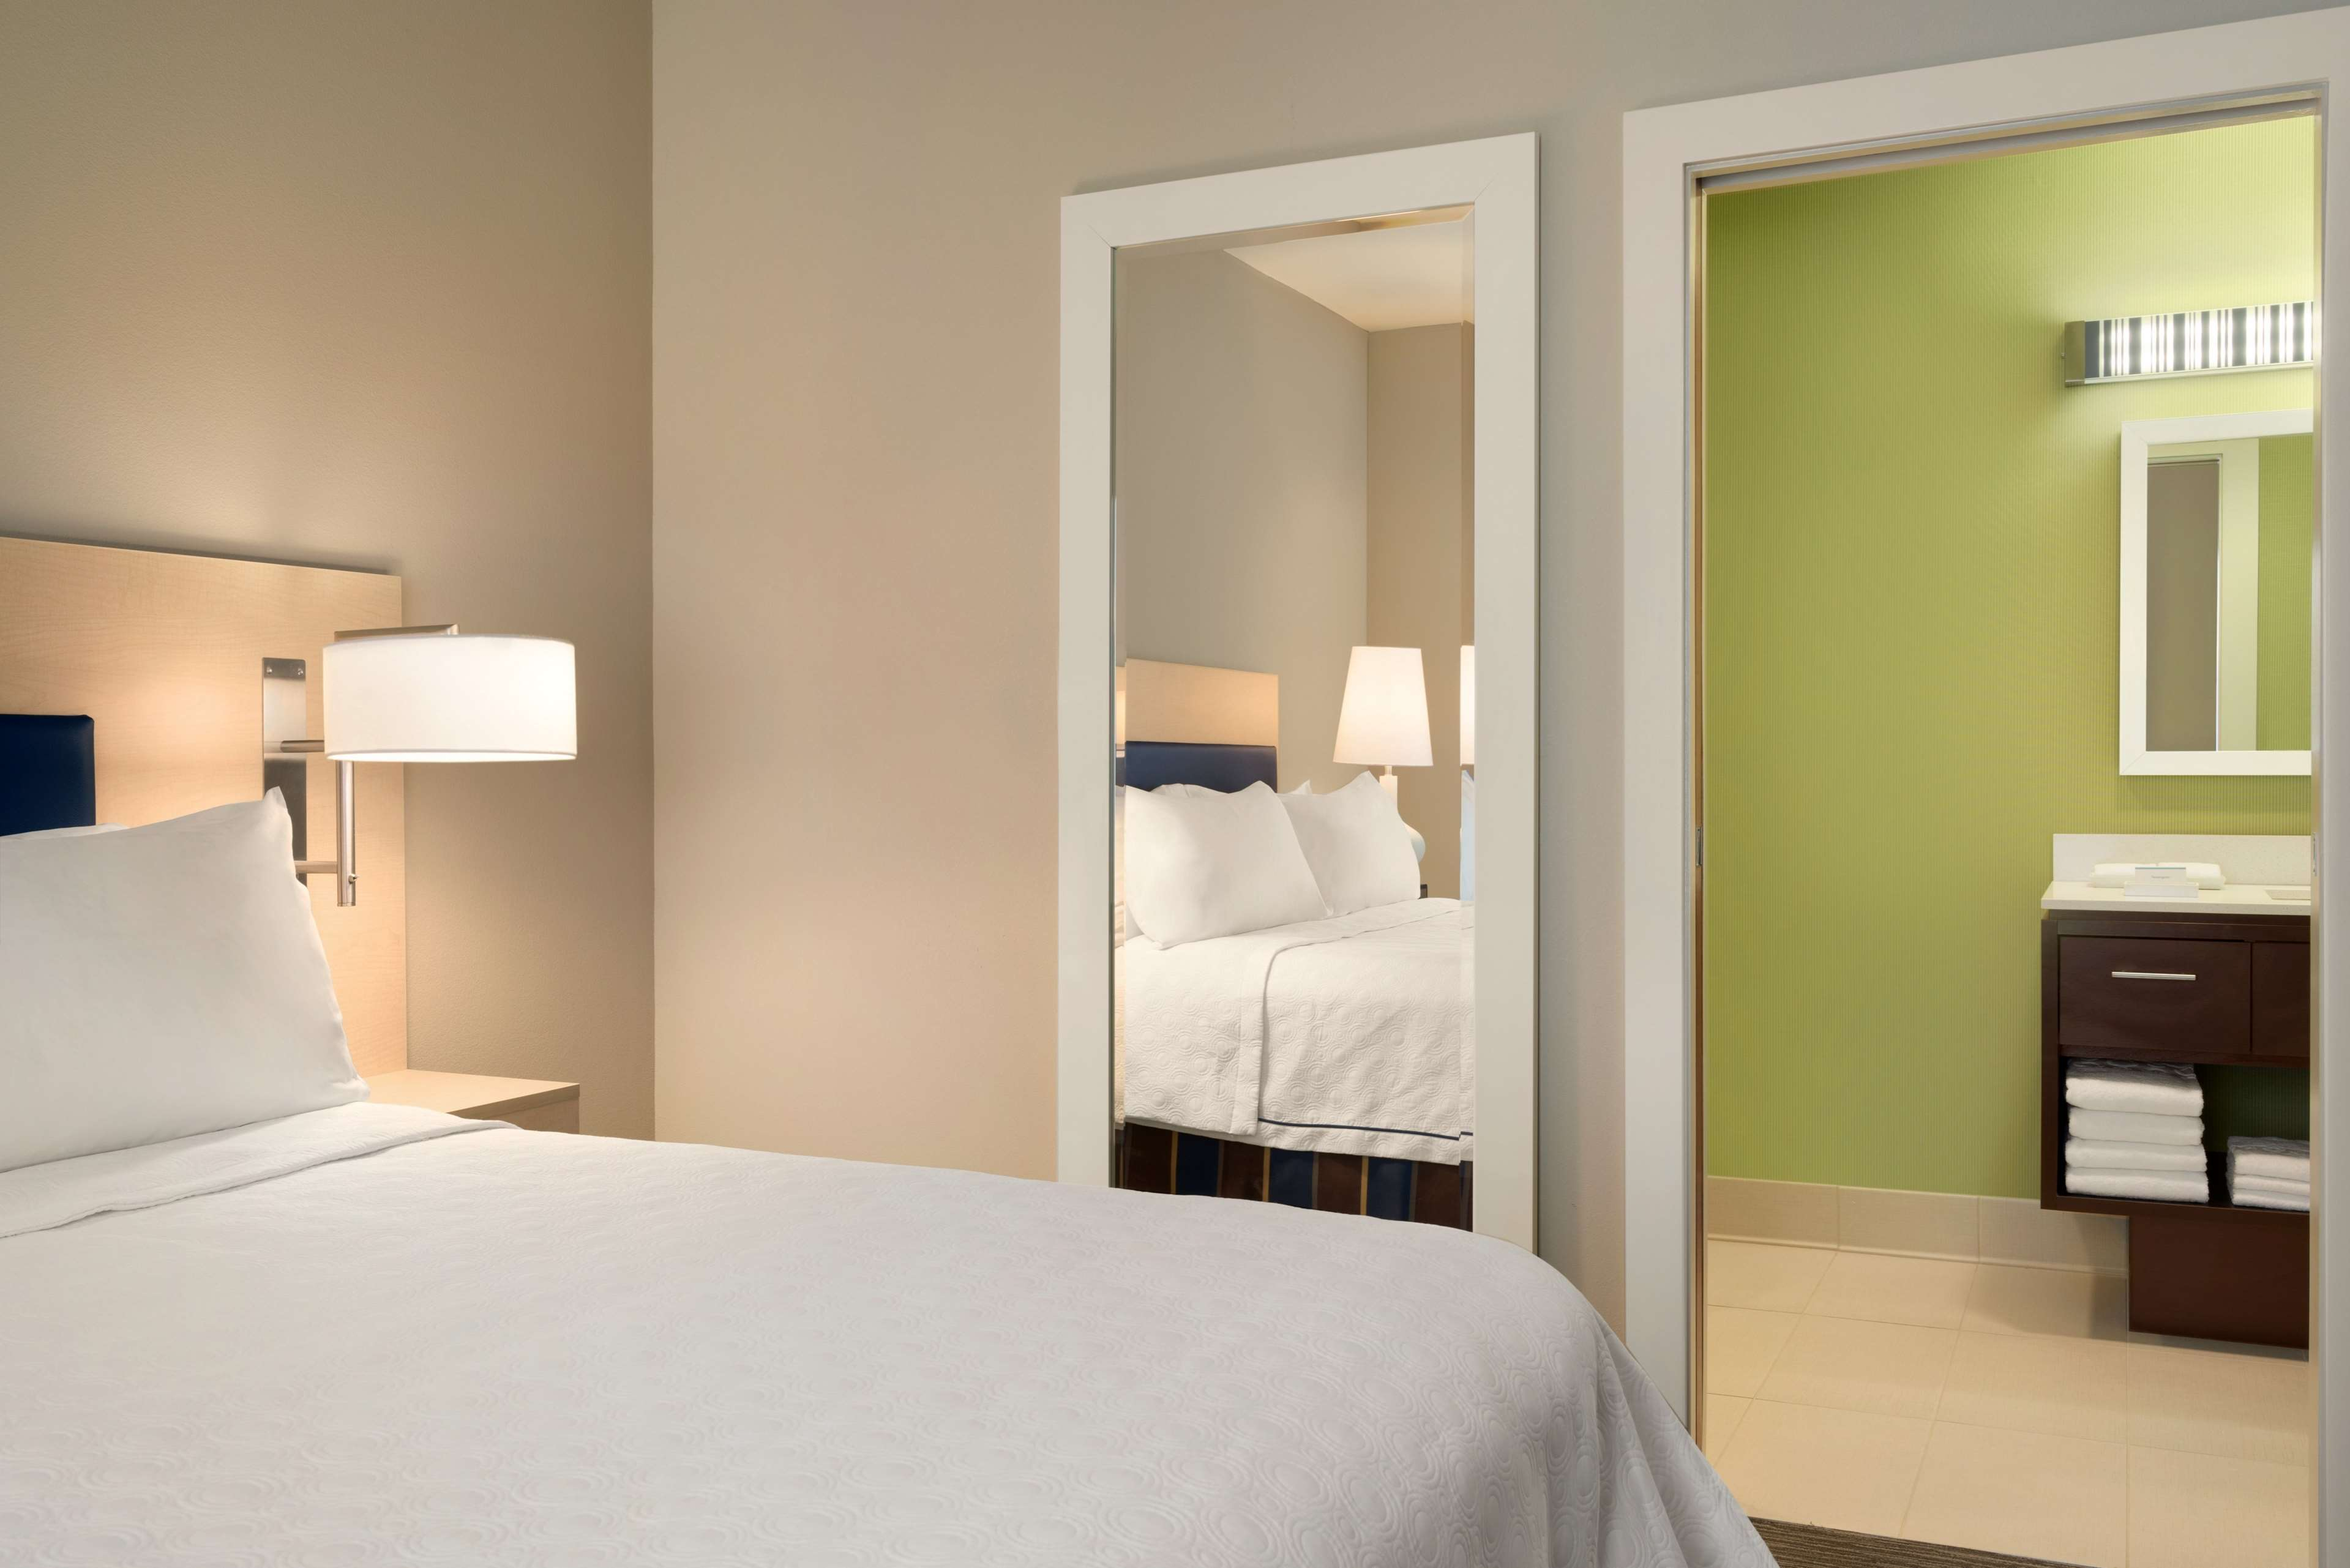 Home2 Suites by Hilton Leavenworth Downtown image 35